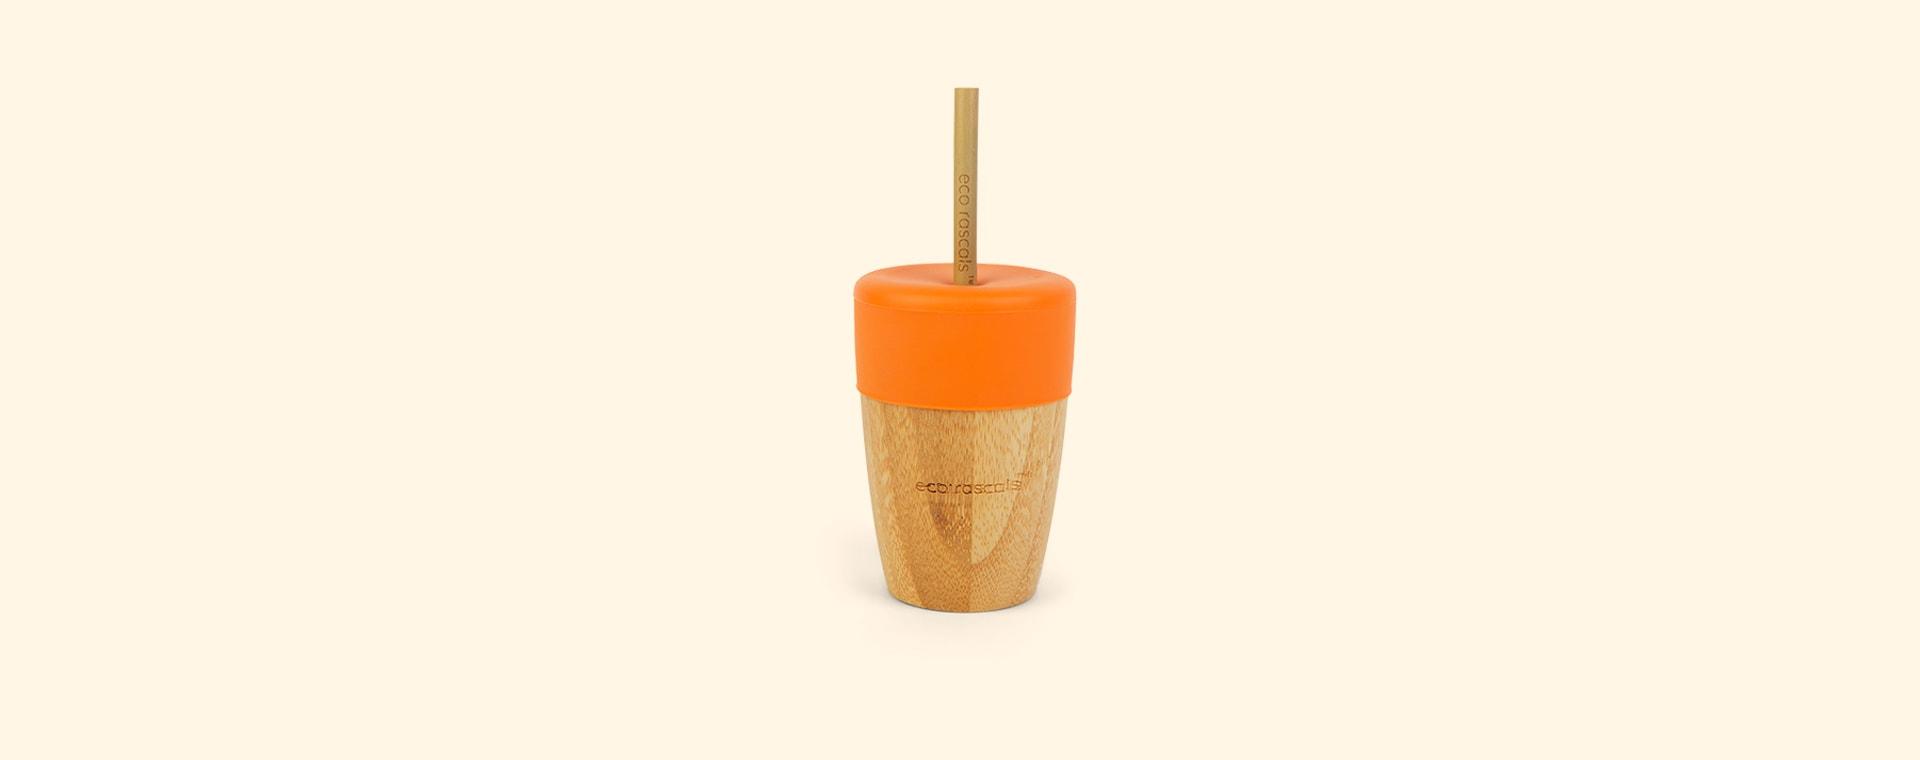 Orange eco rascals Big Cup, Topper & Straws